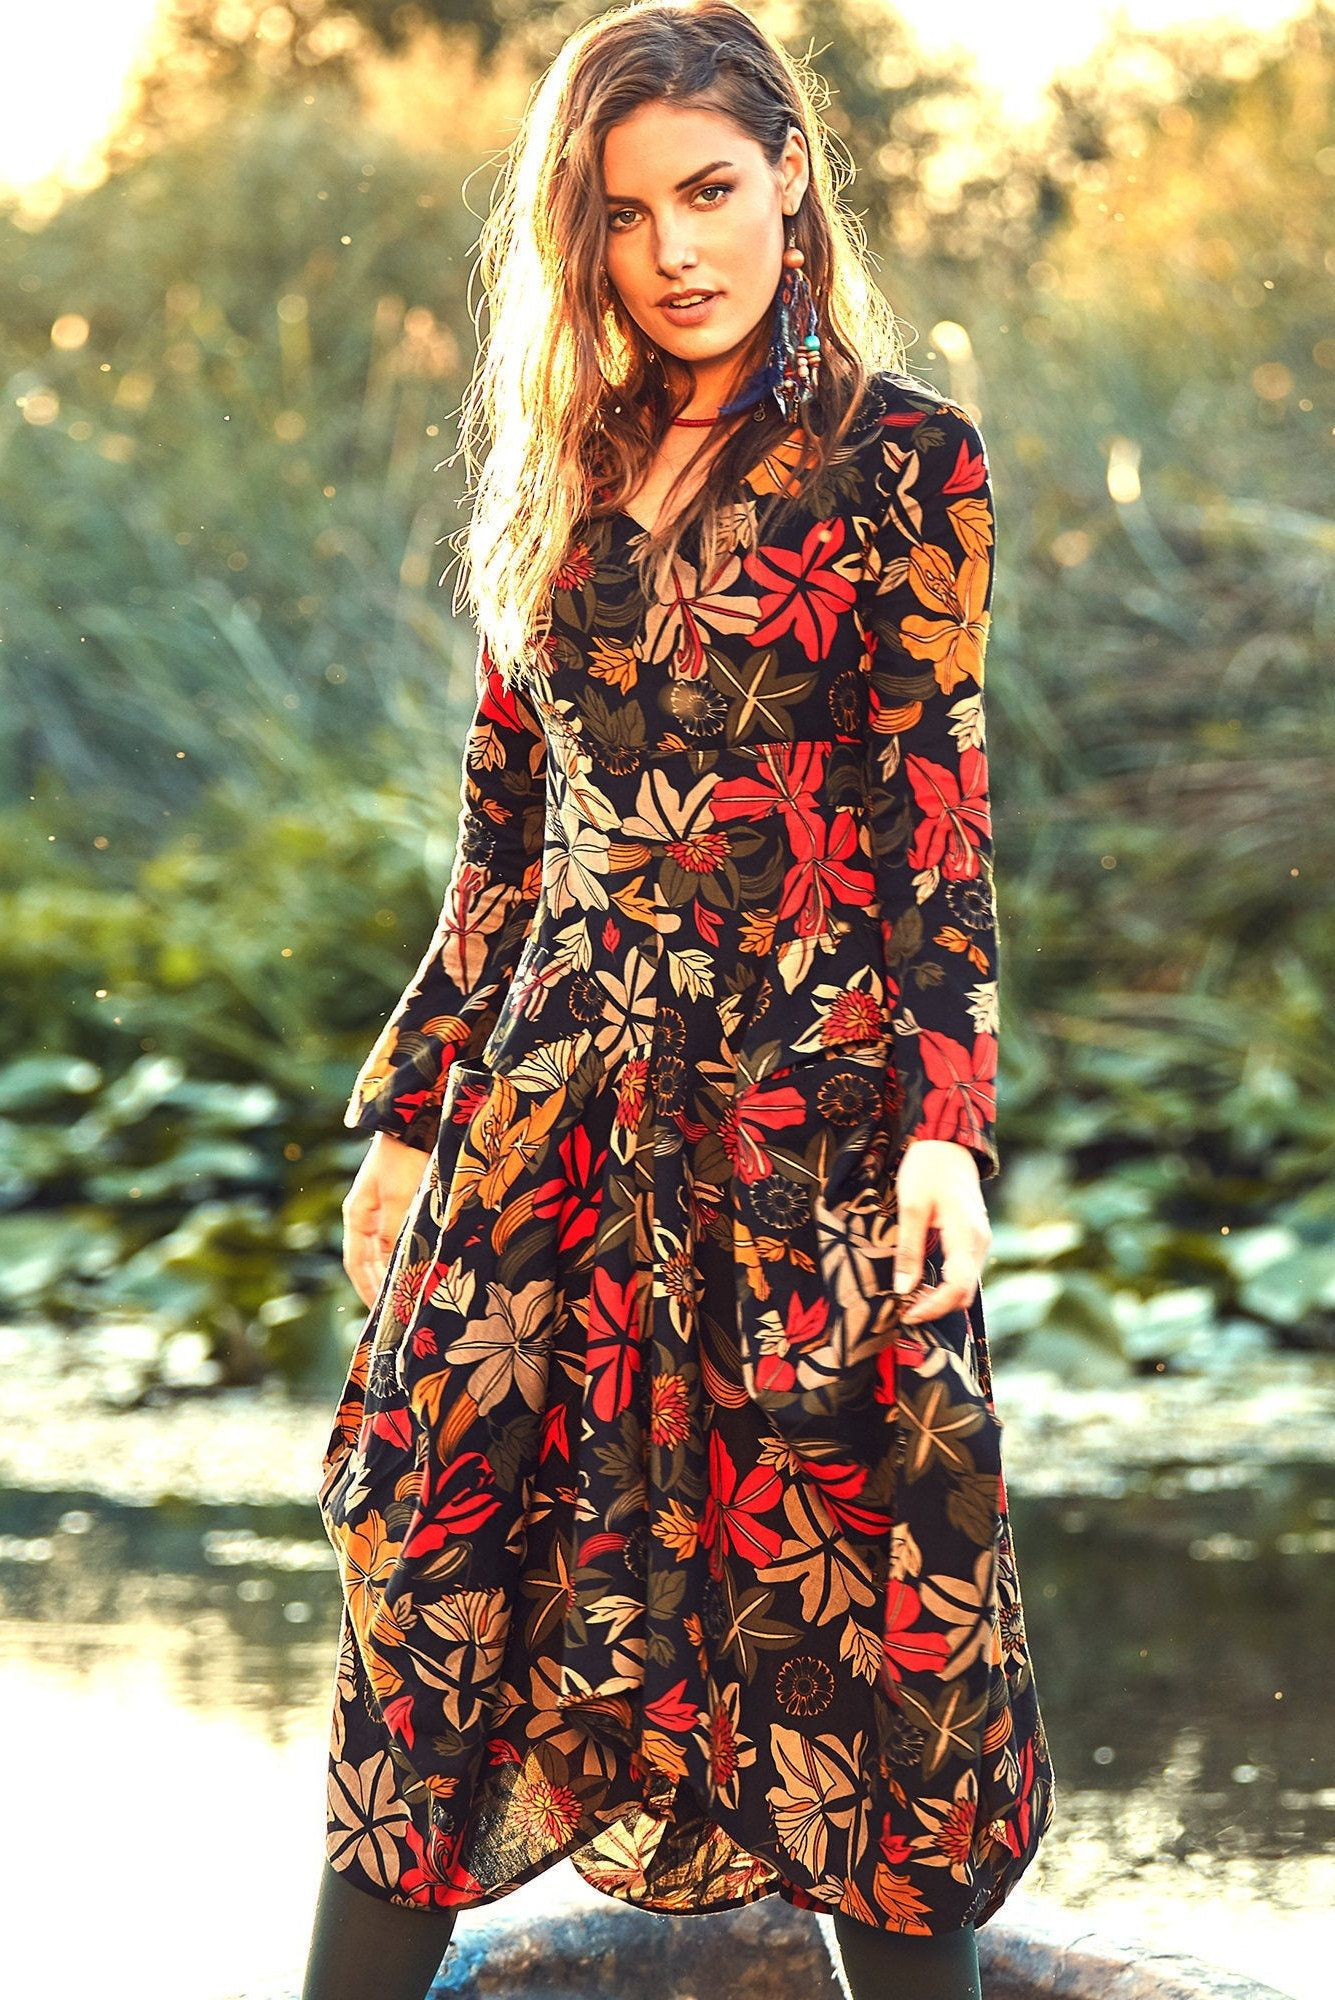 Floral Maxi Dress Asymmetric Dress Long Sleeve Dress Dress With Pockets Medieval Dress Maternity Dress Floral Maxi Dress Maxi Dress Long Sleeve Boho Dress [ 2000 x 1335 Pixel ]